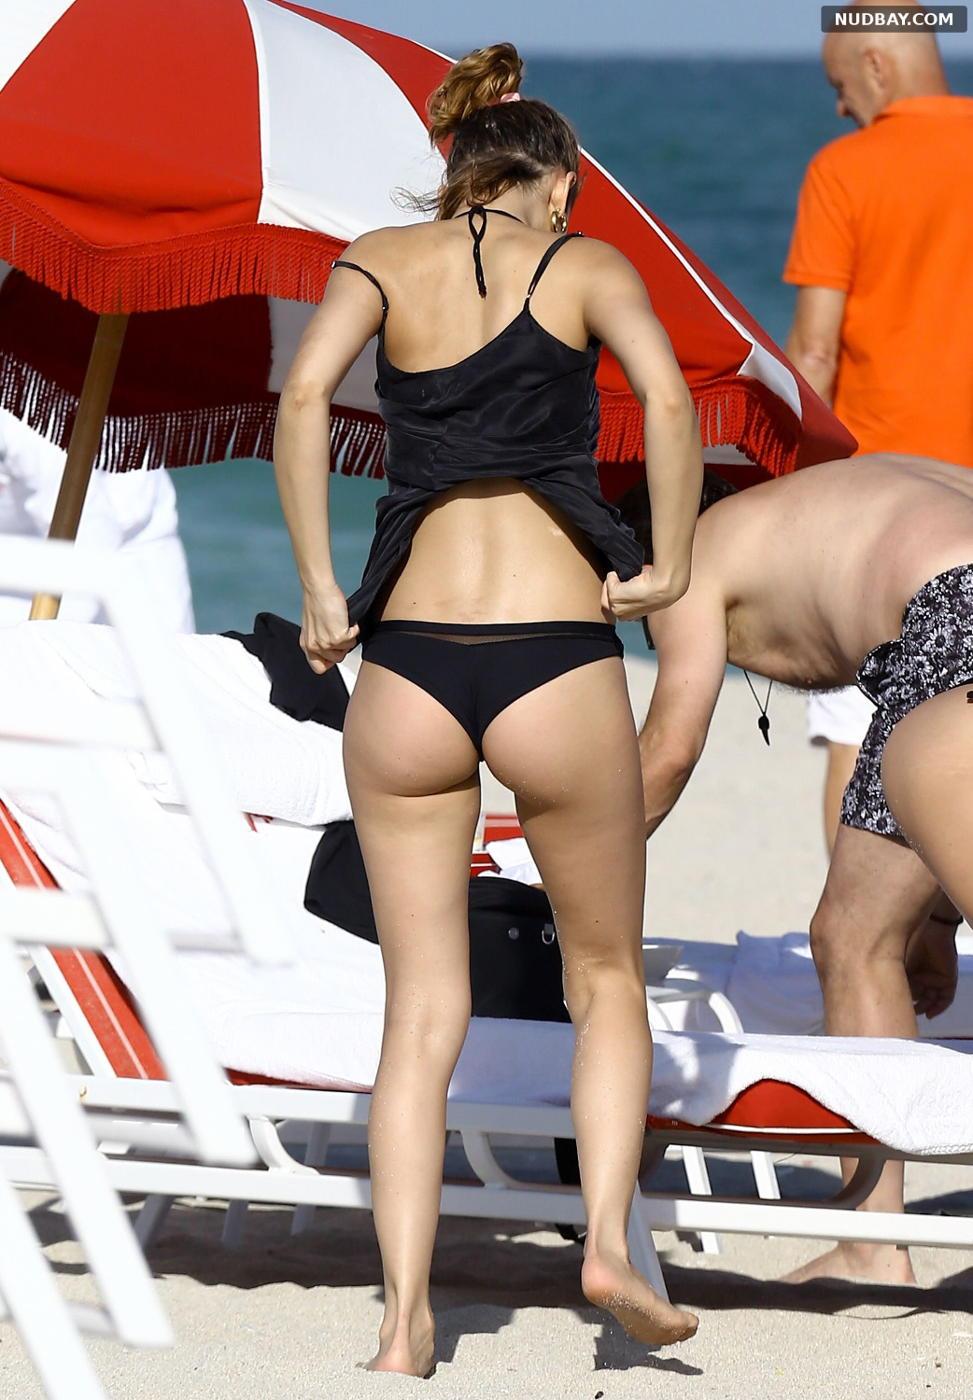 Ursula Corbero booty on the beach in Miami Florida December 04 2016